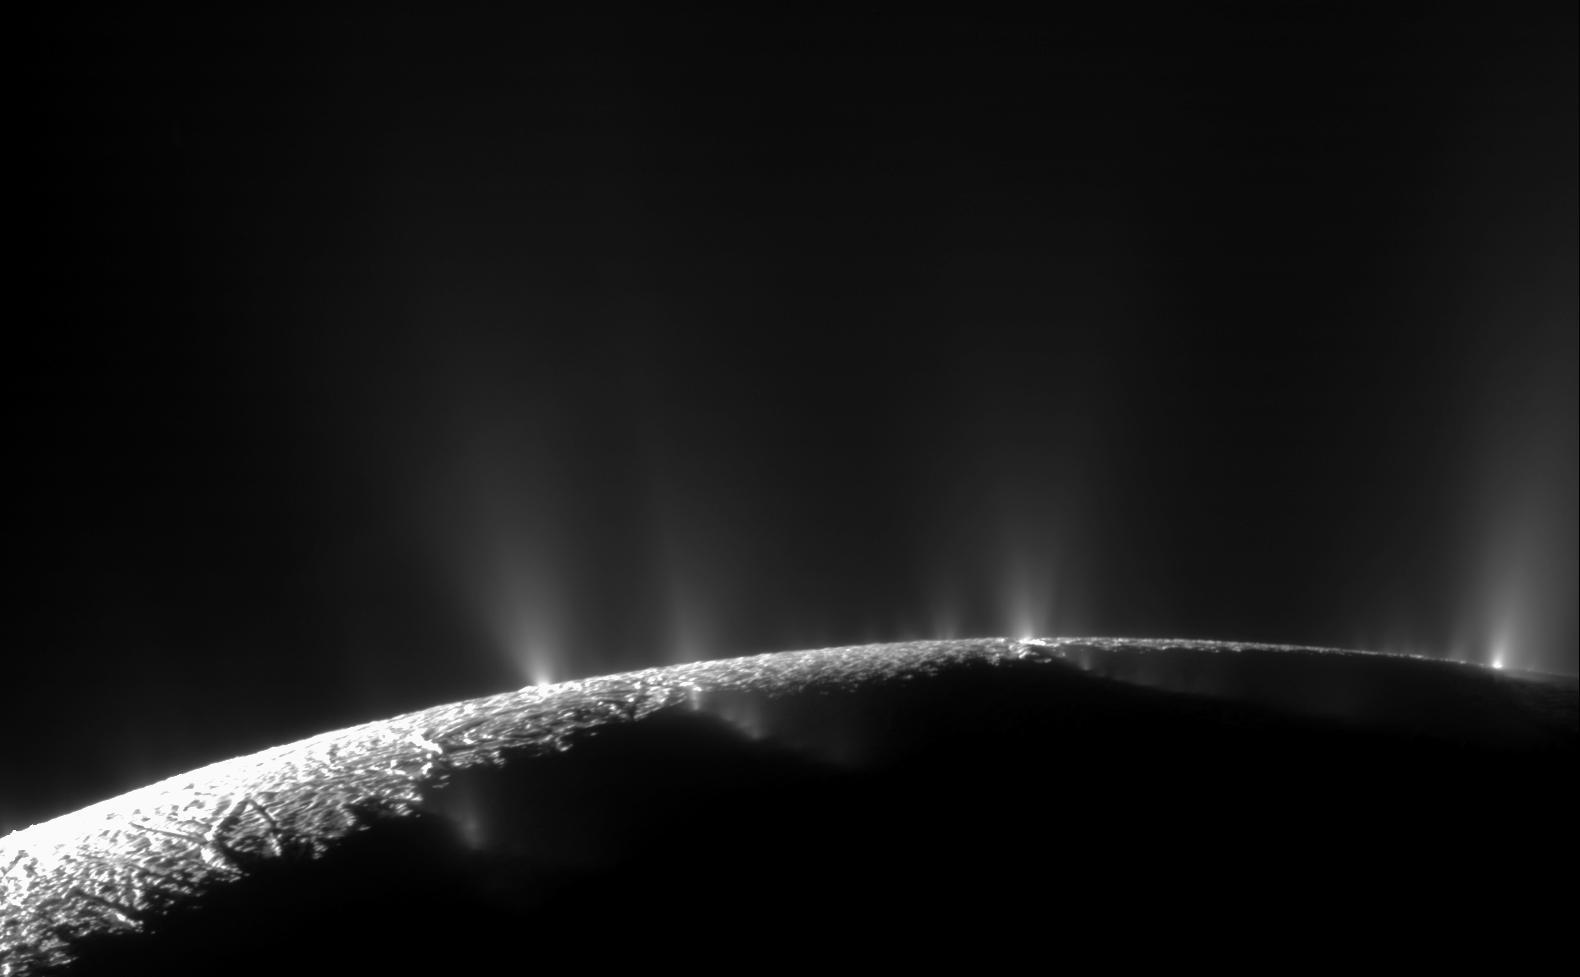 Surprising Geysers on Saturn Moon Enceladus Hint at Plumbing Mystery